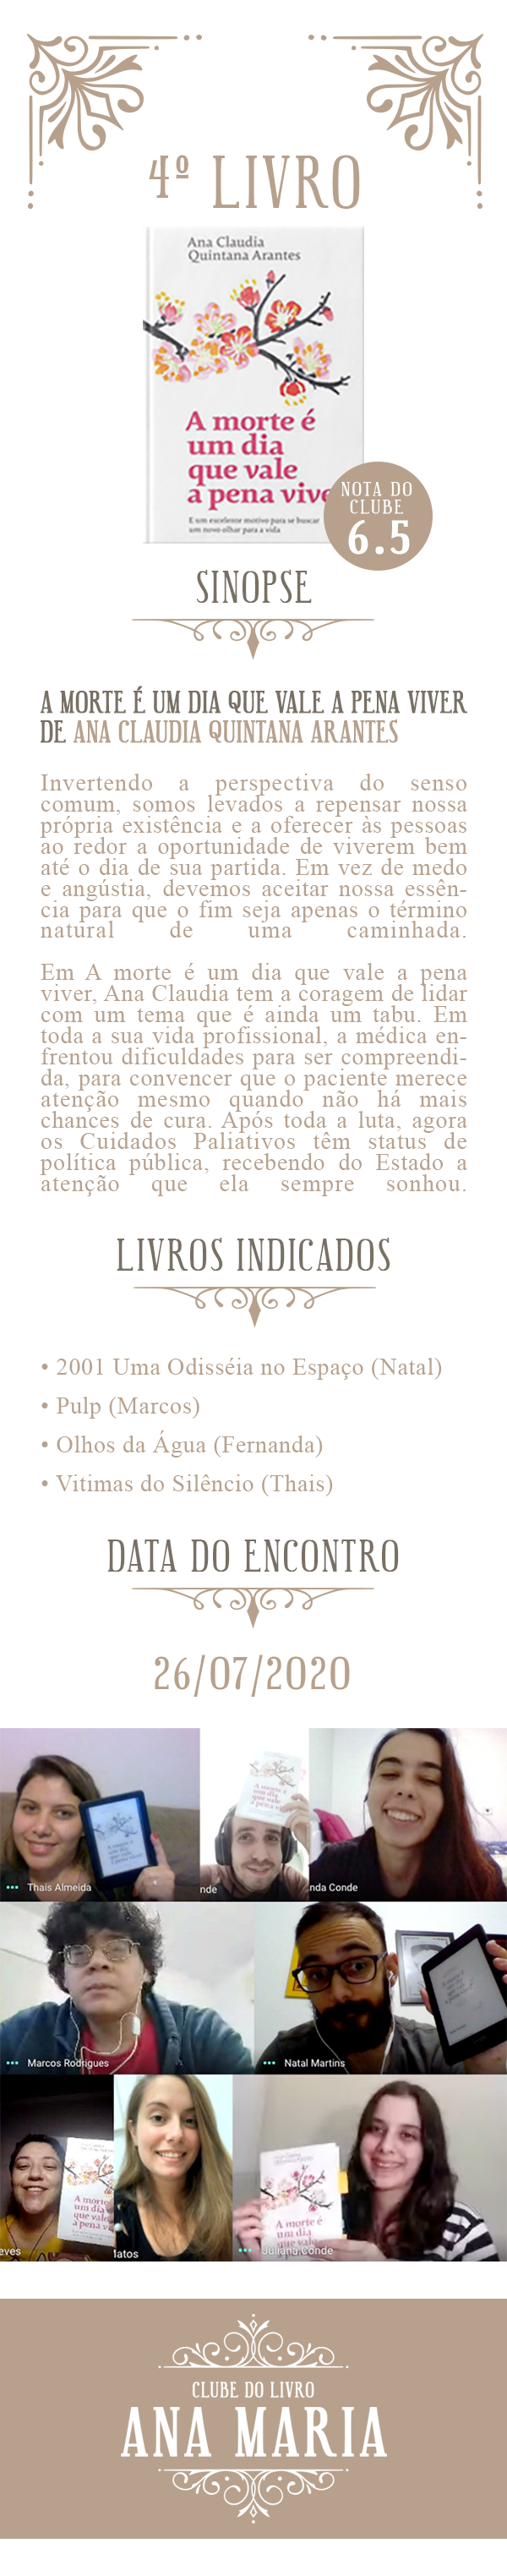 livro-4.png